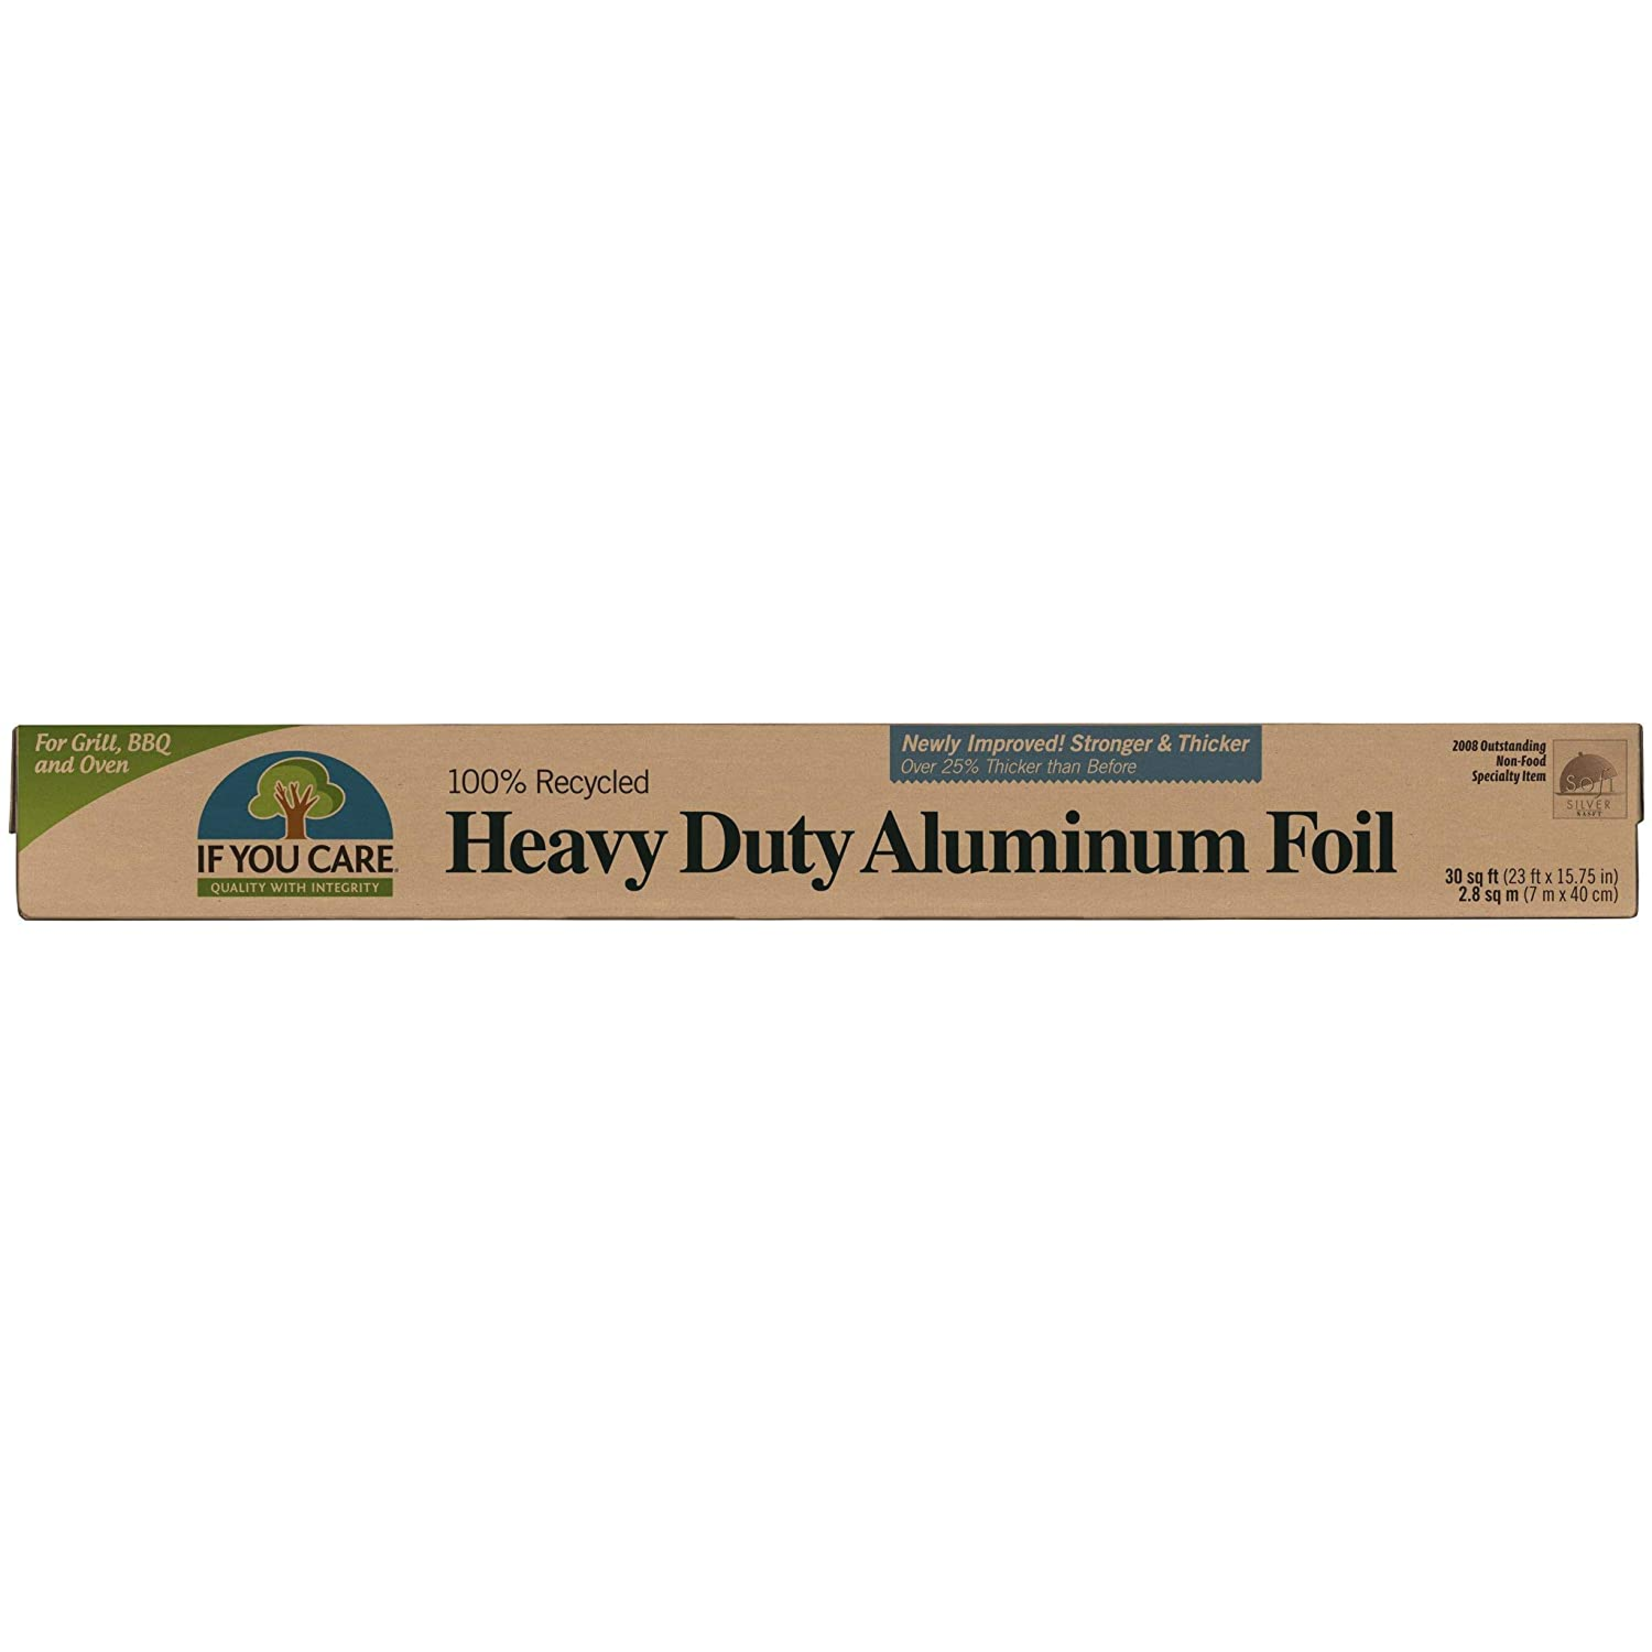 If You Care If You Care Heavy Duty Aluminium foil